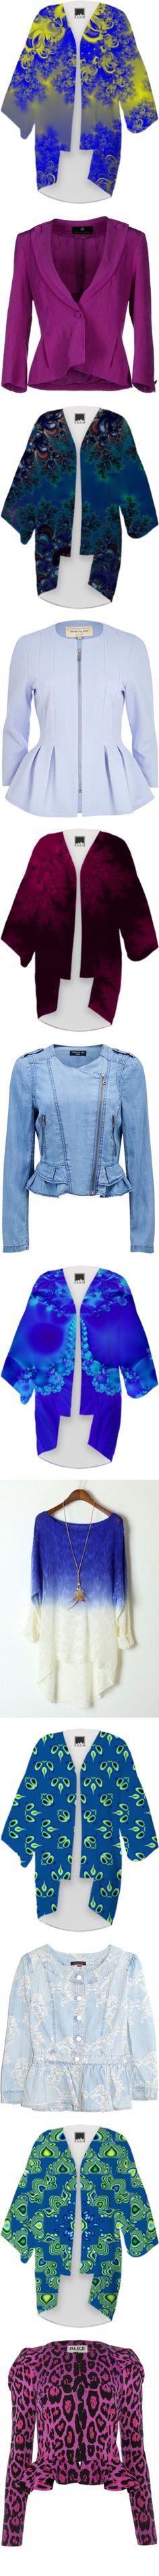 * #OUTERWEAR: #BLUE & #PURPLE * by artist4god-rose-santuci-sofranko on Polyvore featuring polyvore, fashion, clothing, intimates, robes, coats, kimono, kimono robe, outerwear, jackets, blazers, purple, rena lange, long sleeve jacket, multi pocket jacket, single button blazer, silk blazer, sale, textured jacket, light blue jacket, zipper jacket, collarless jacket, jersey knit jacket, purple robe, purple kimono, chambray sky, blue moto jacket, blue biker jacket, biker jacket, chambray jacket…